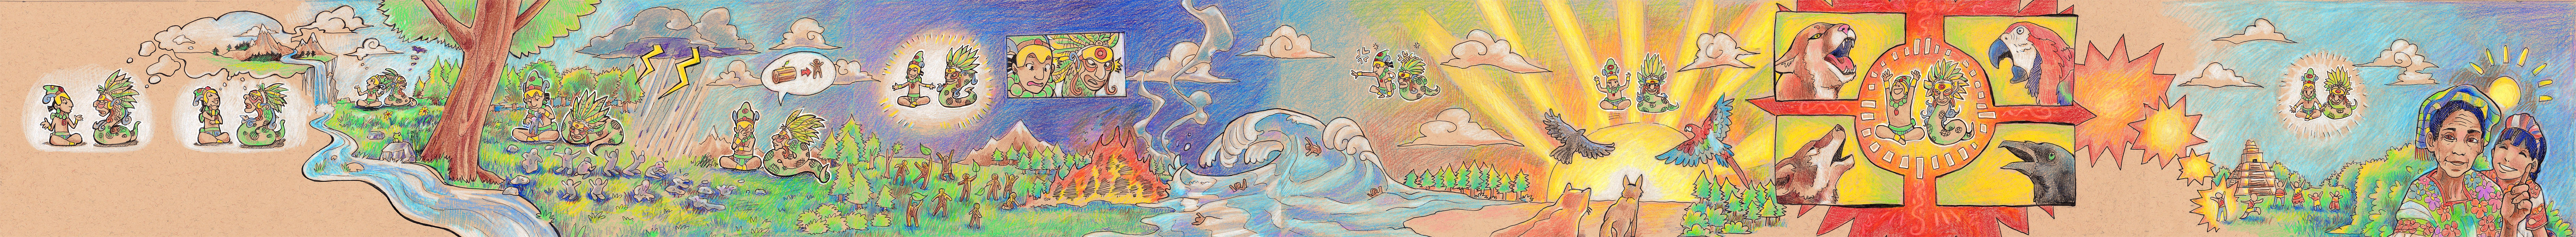 Mayan Creation Myth by TheK40